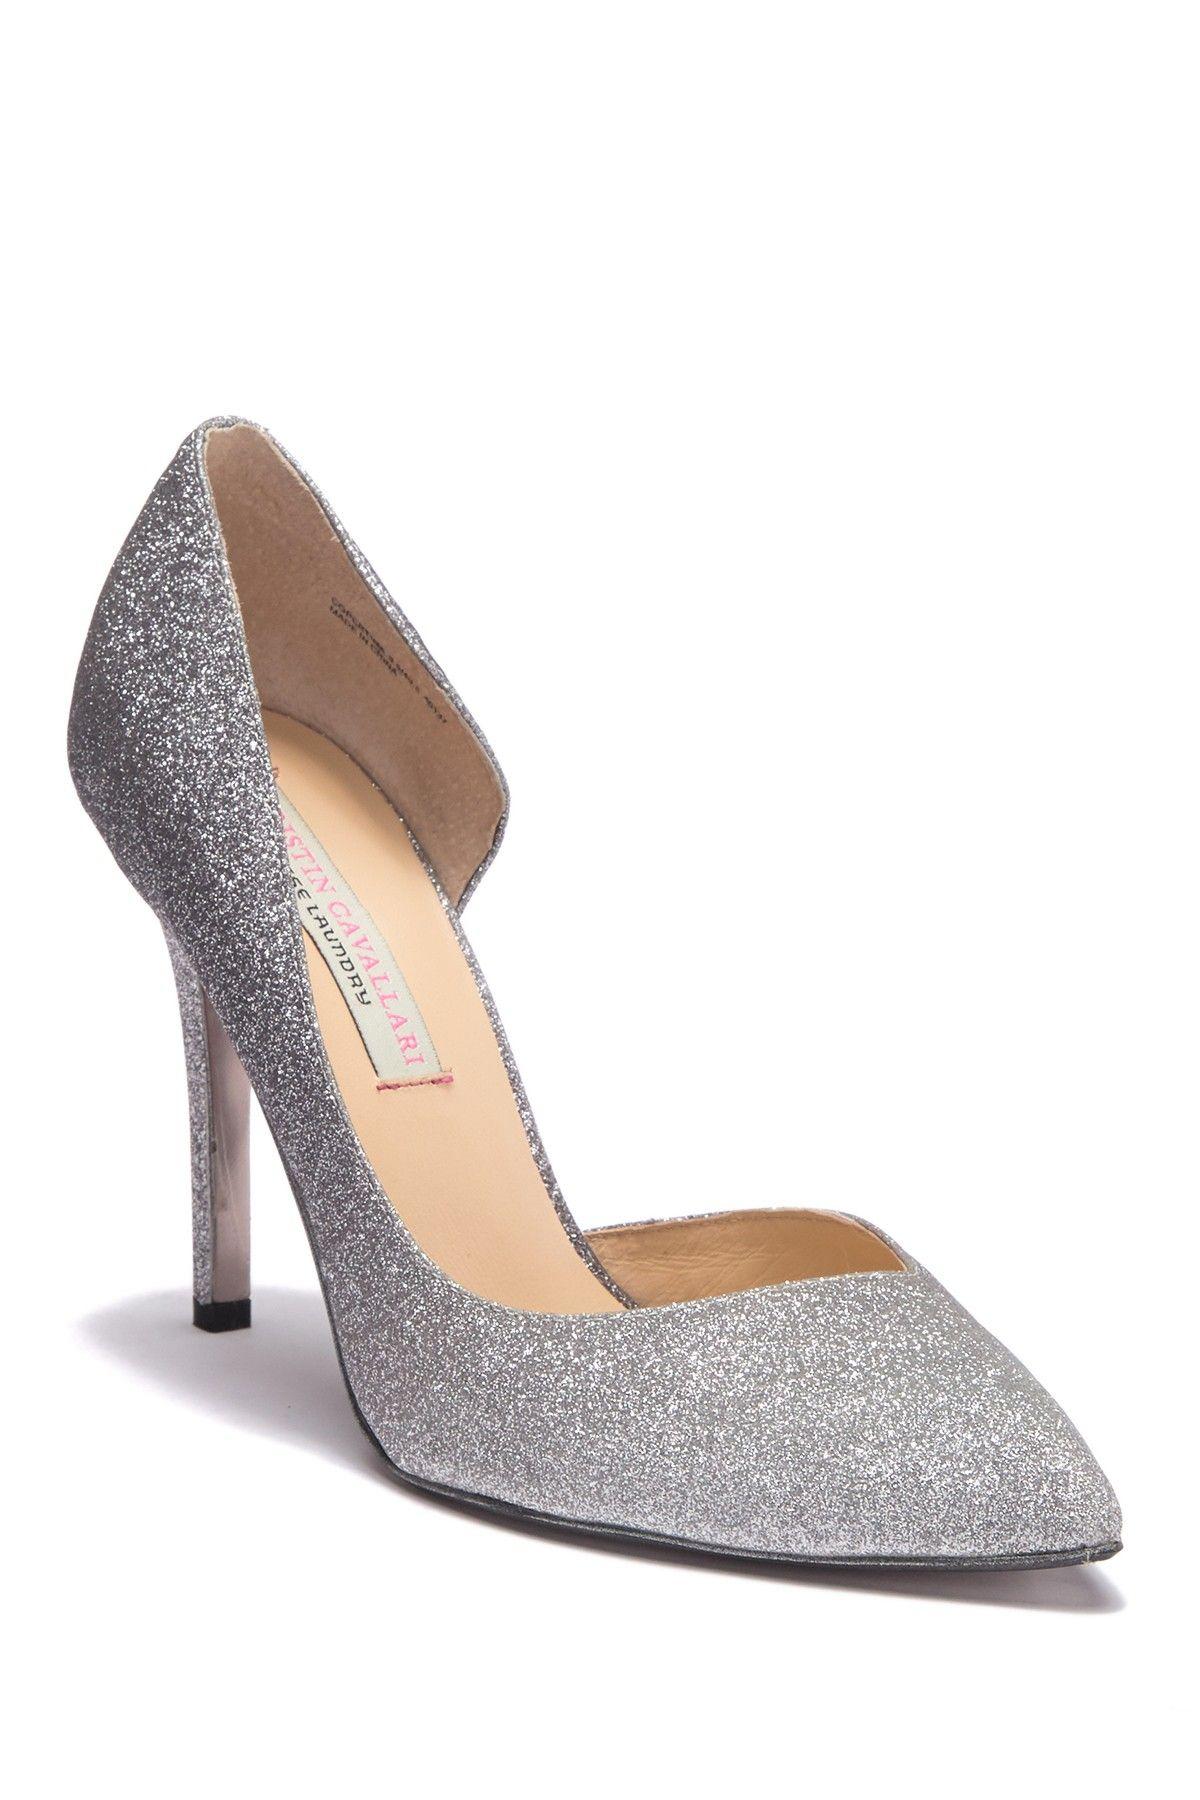 ac412f7d7 Card Kristin Cavallari, Silver Heels, Chinese Laundry, Wedding Shoes,  Kitten Heels,